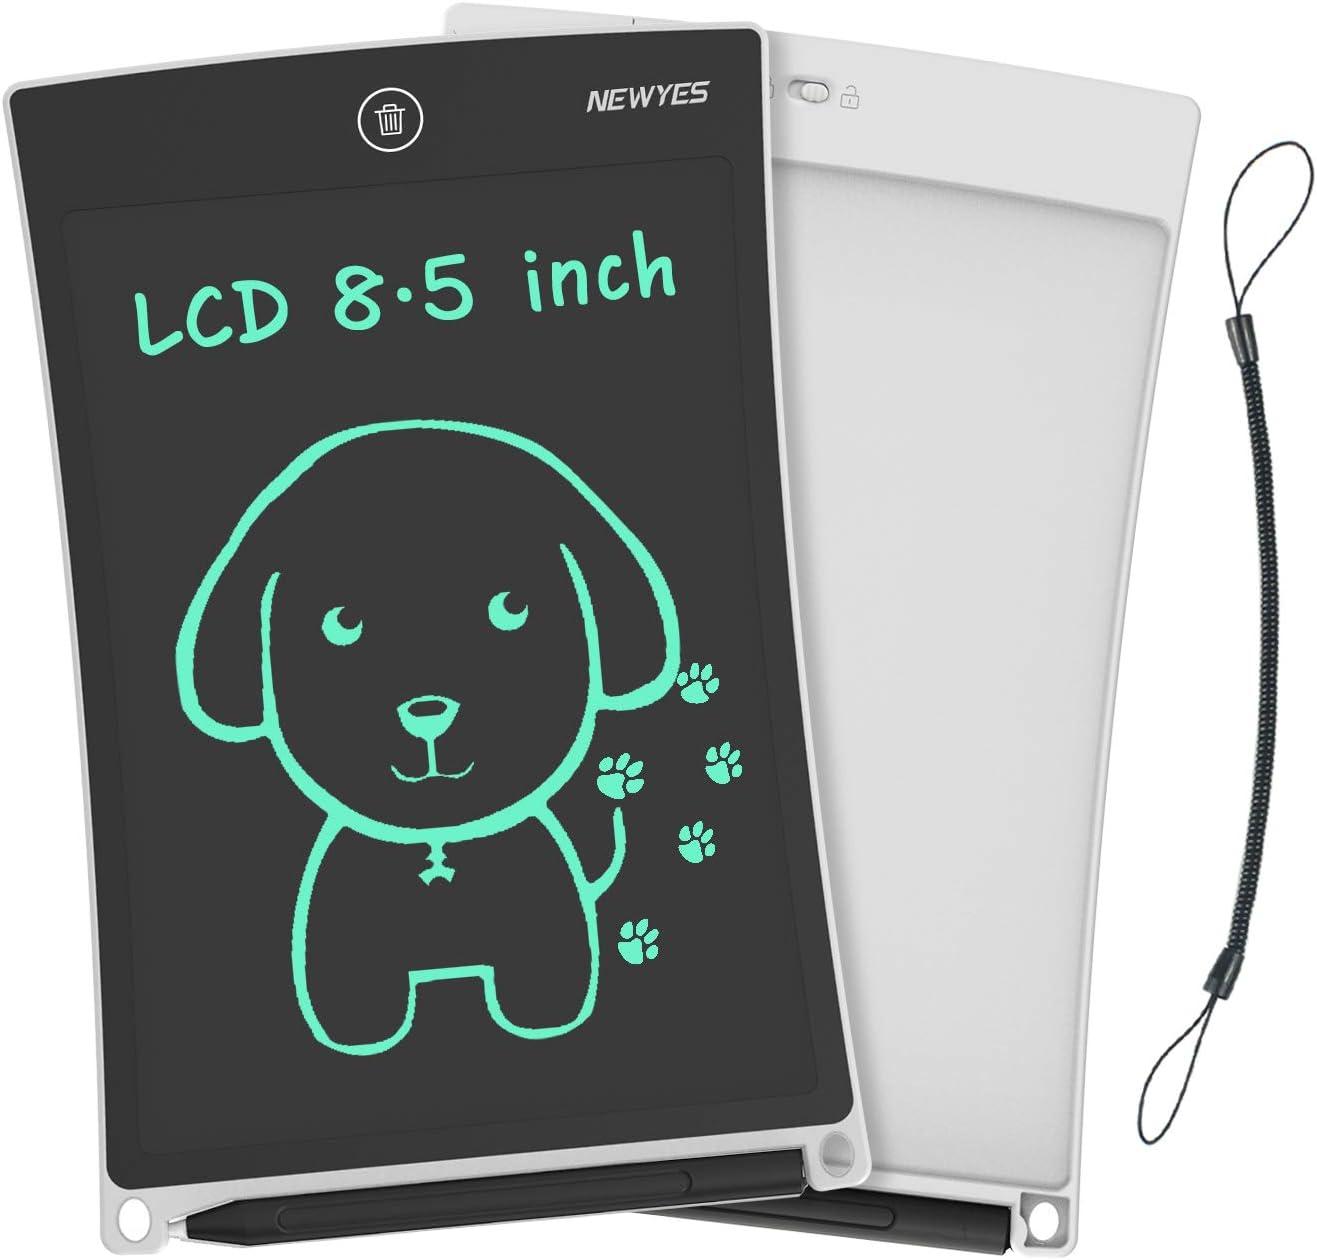 NEWYES NYWT850 Tavoletta Grafica LCD Scrittura, 8,5 Pollici di Lunghezza